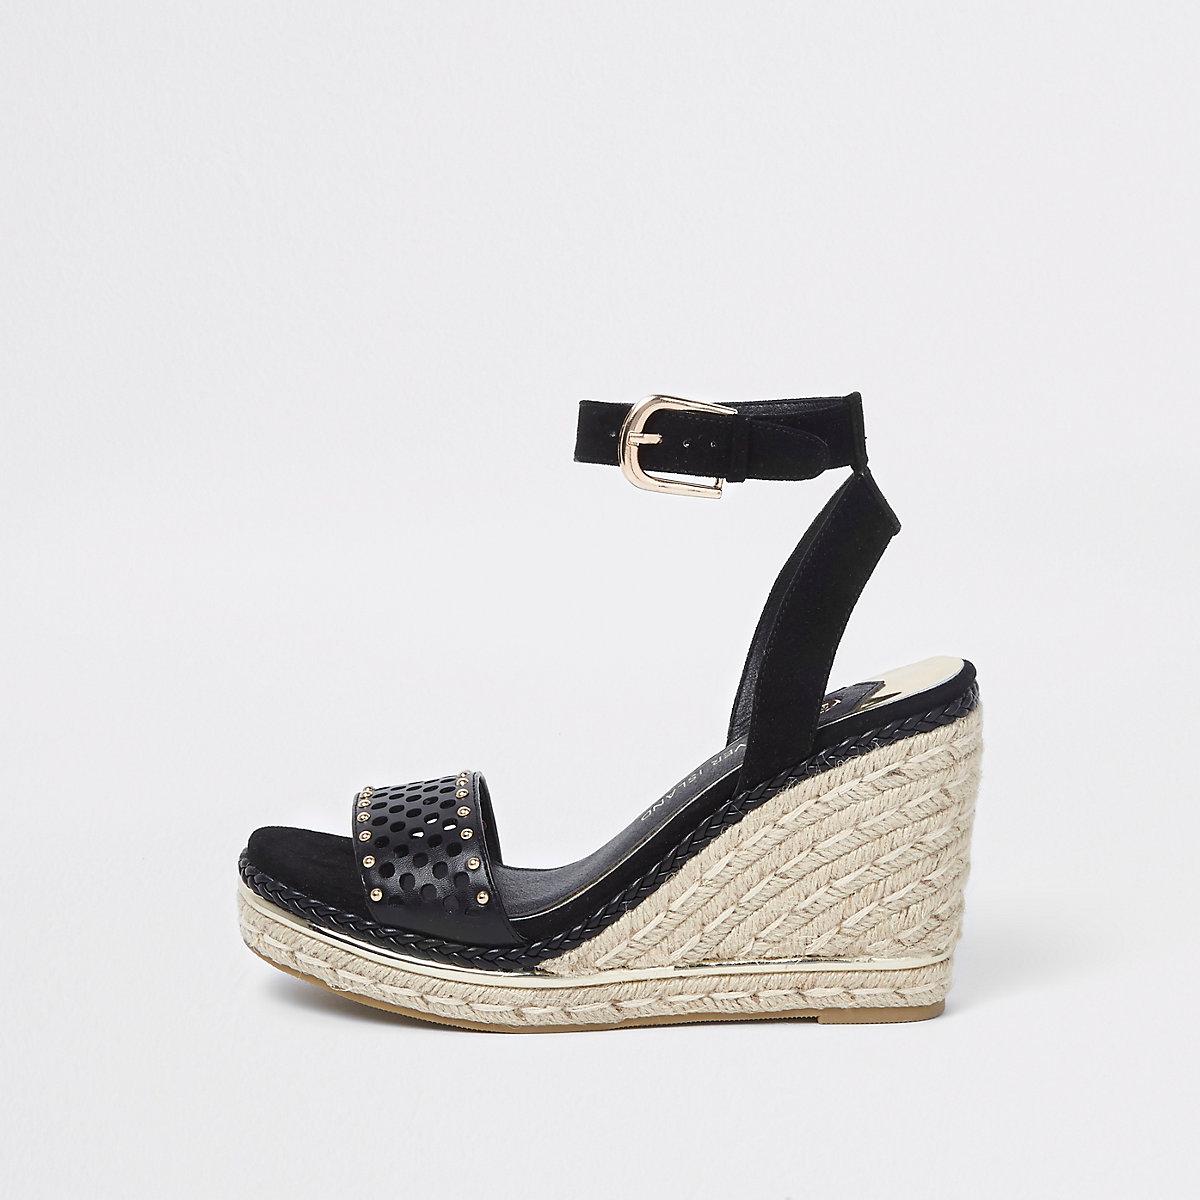 83b64b19f010b3 Black laser cut studded espadrille wedges - Shoes - Shoes   Boots - women